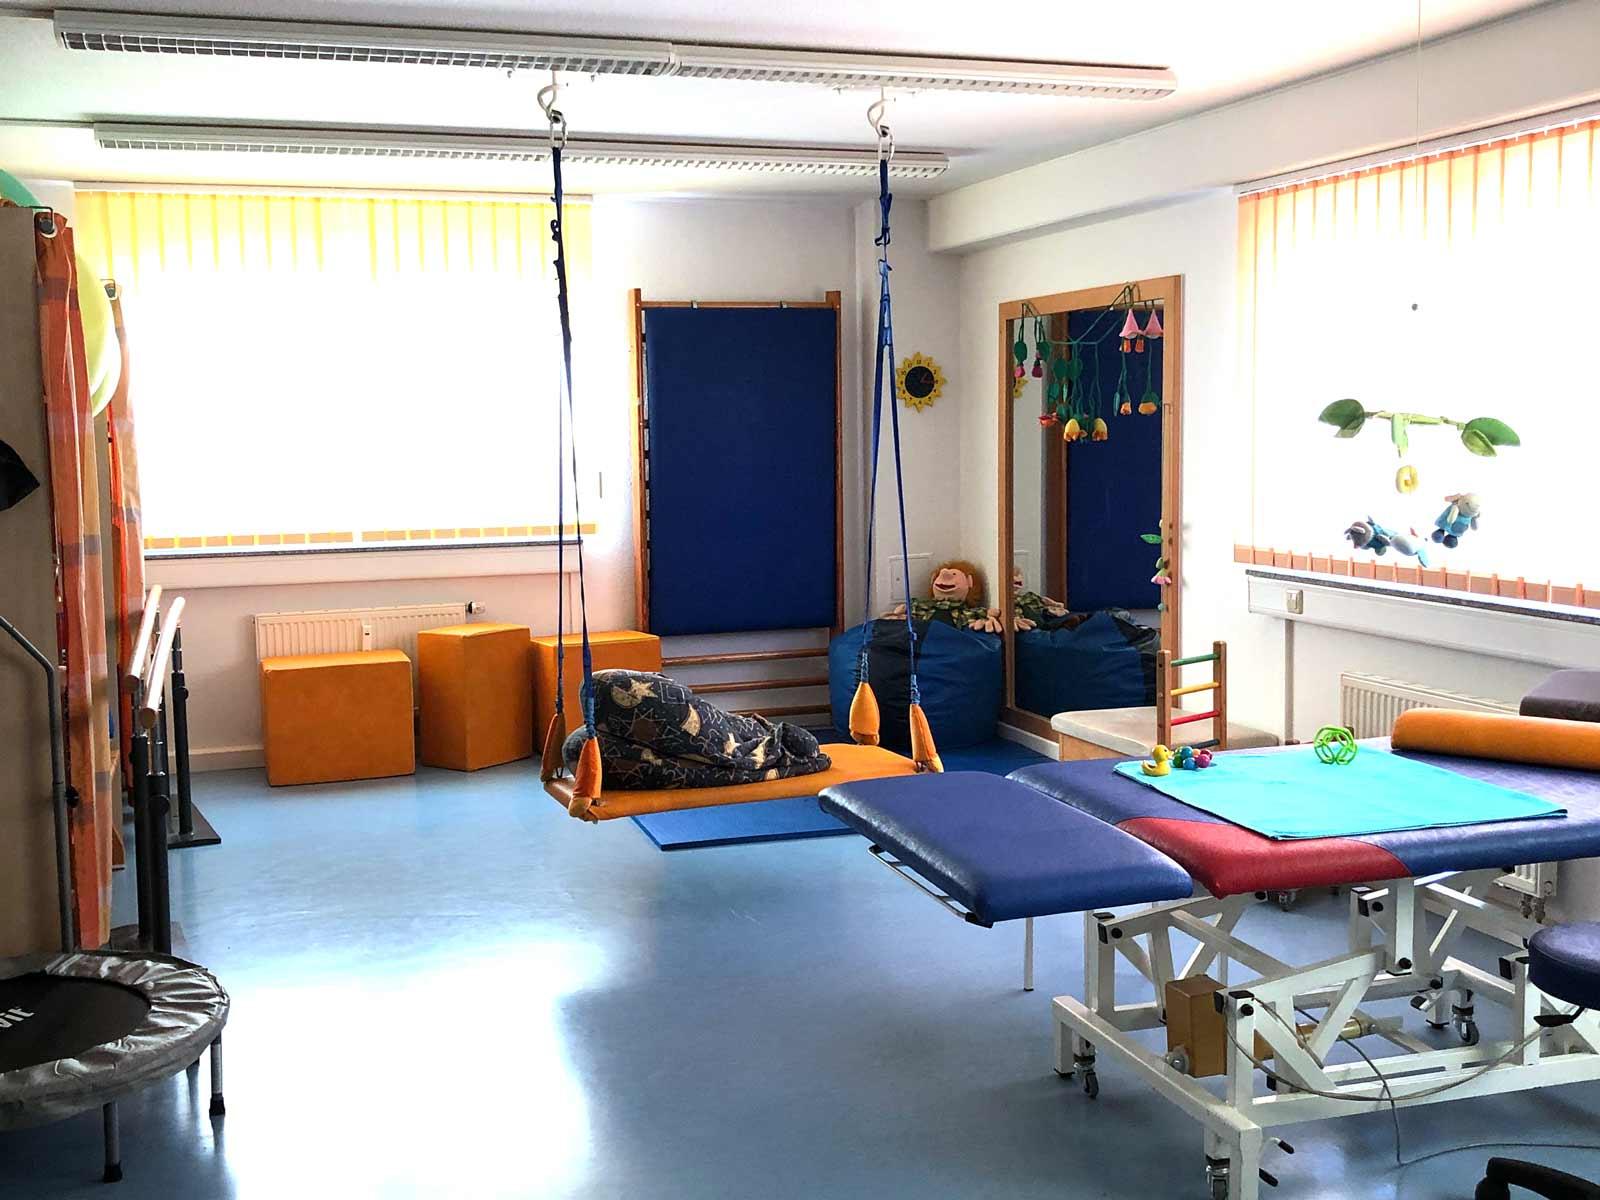 behandlungsraum-physiotherapie-säuglinge-kinder-praxisgemeinschaft-impulse-rastatt